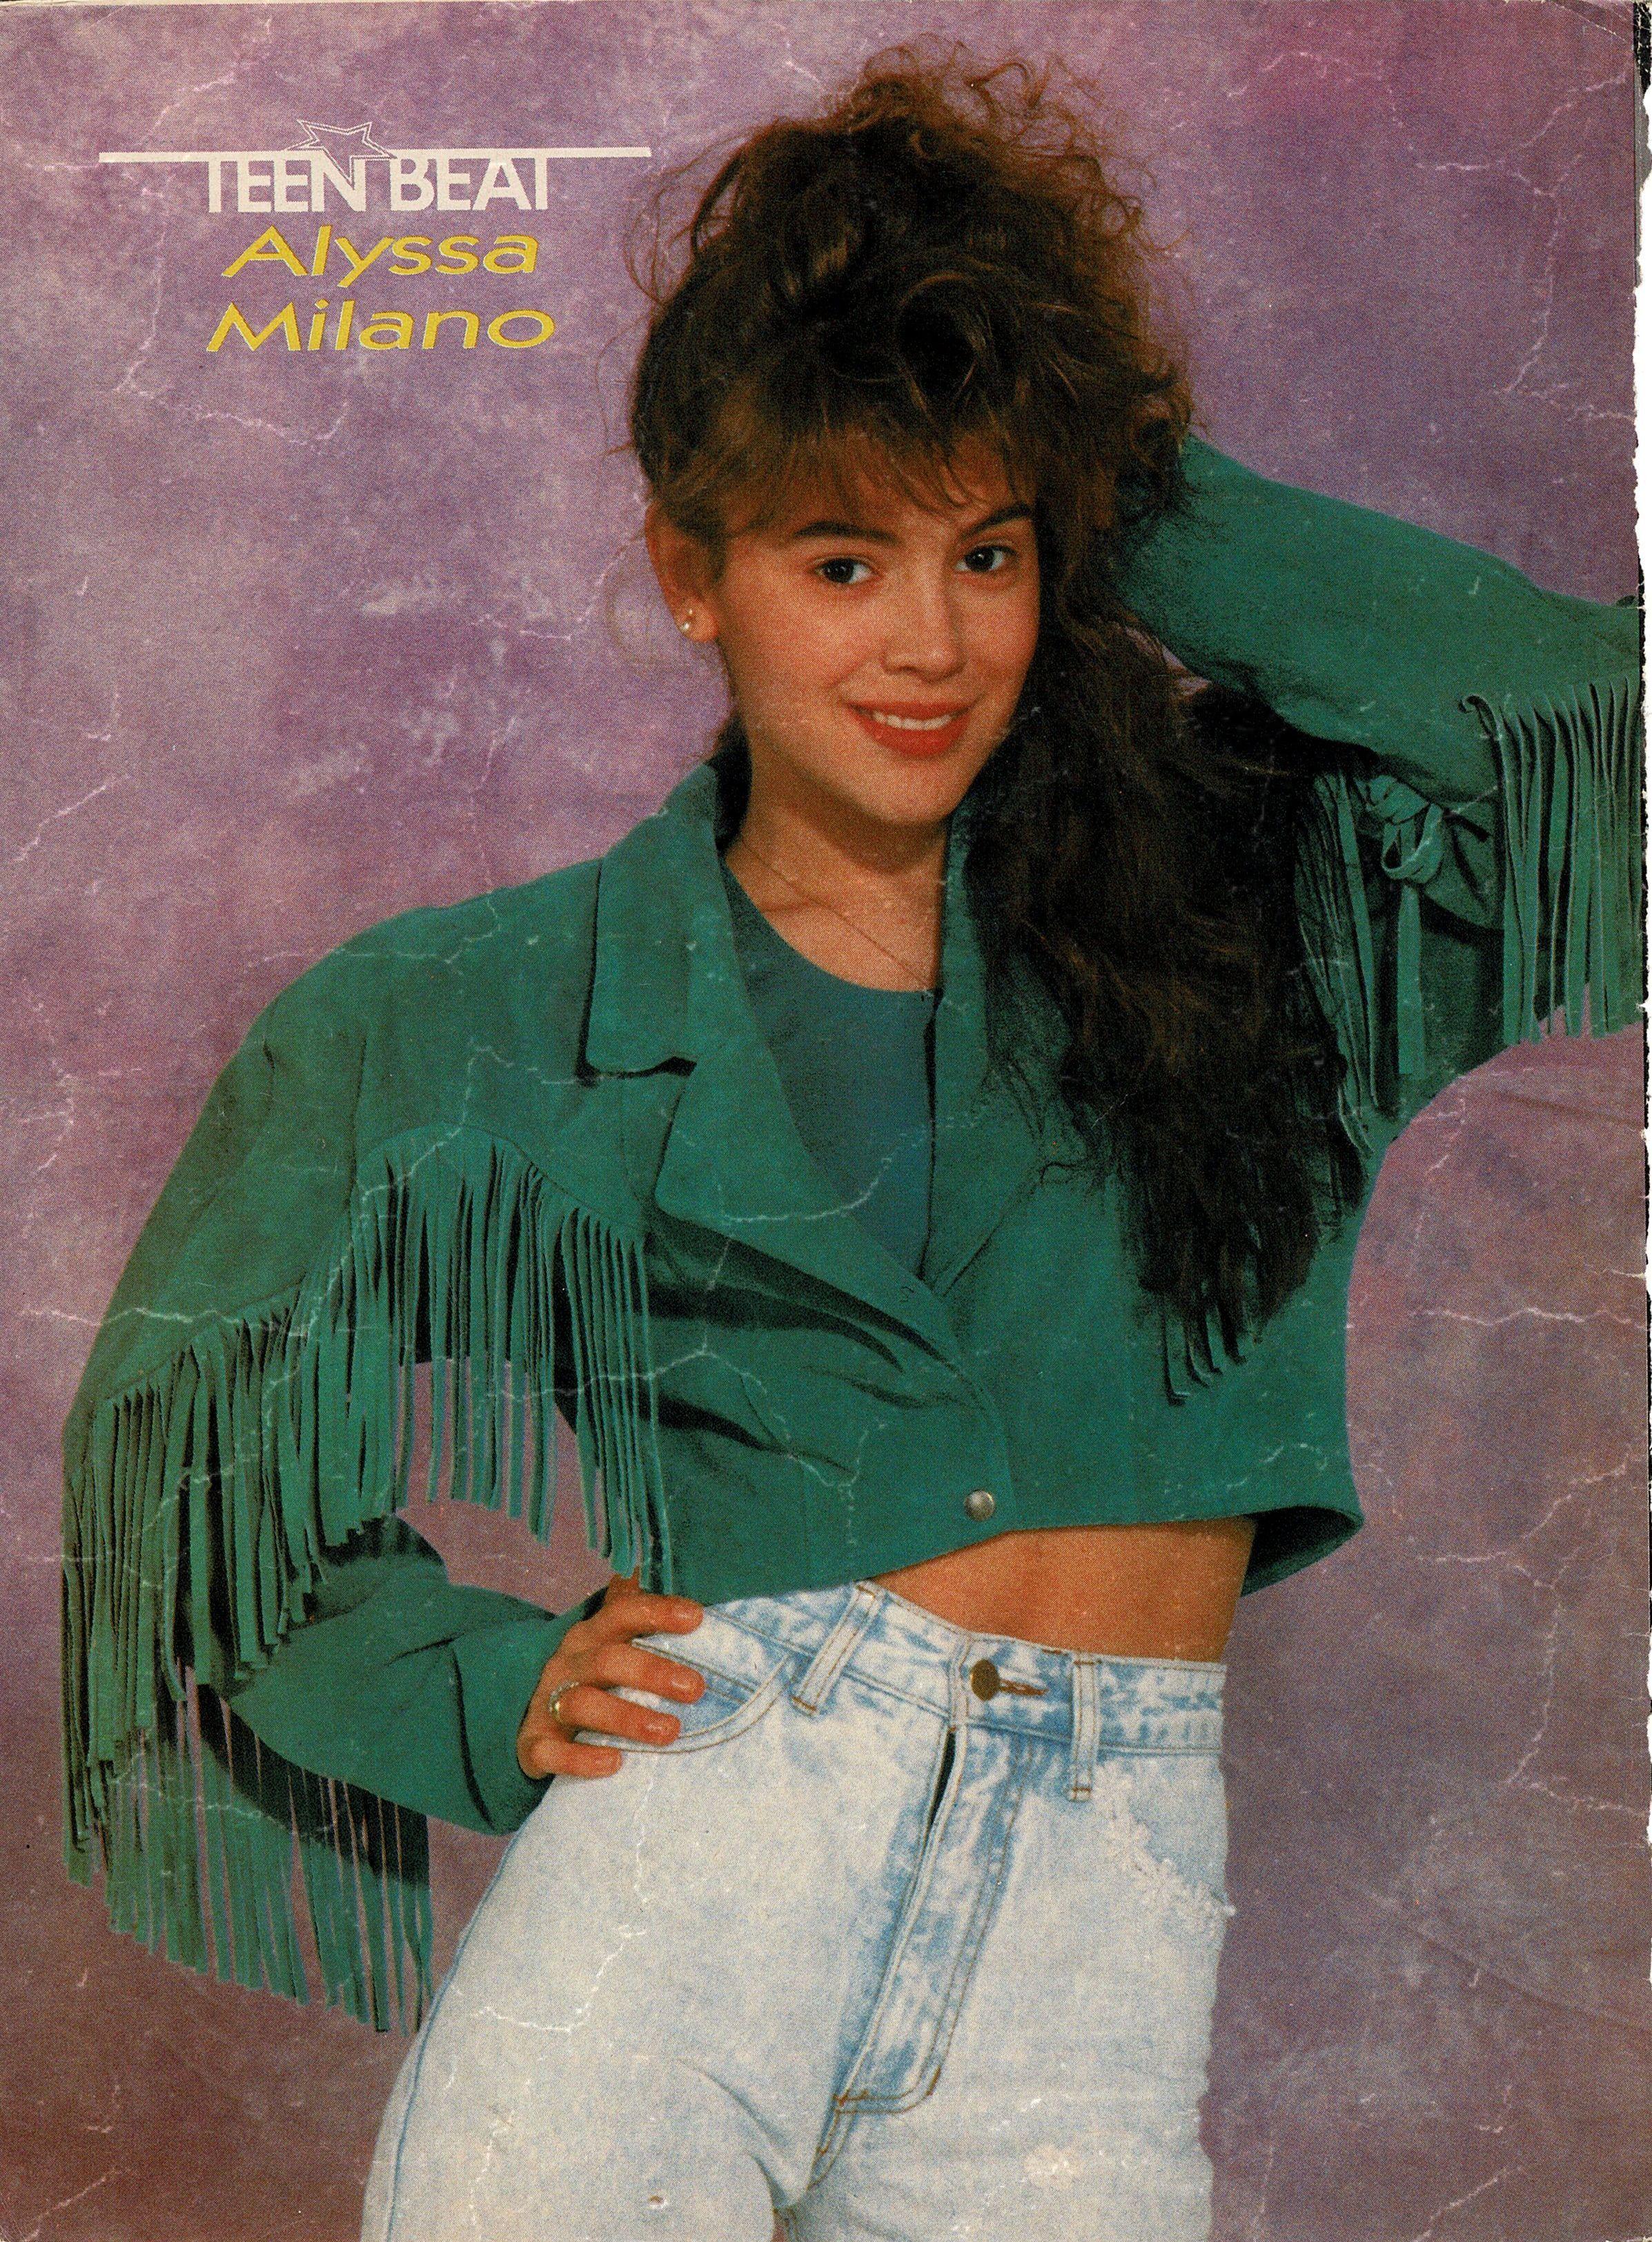 bb5bee89289 Teen Beat magazine September 1989